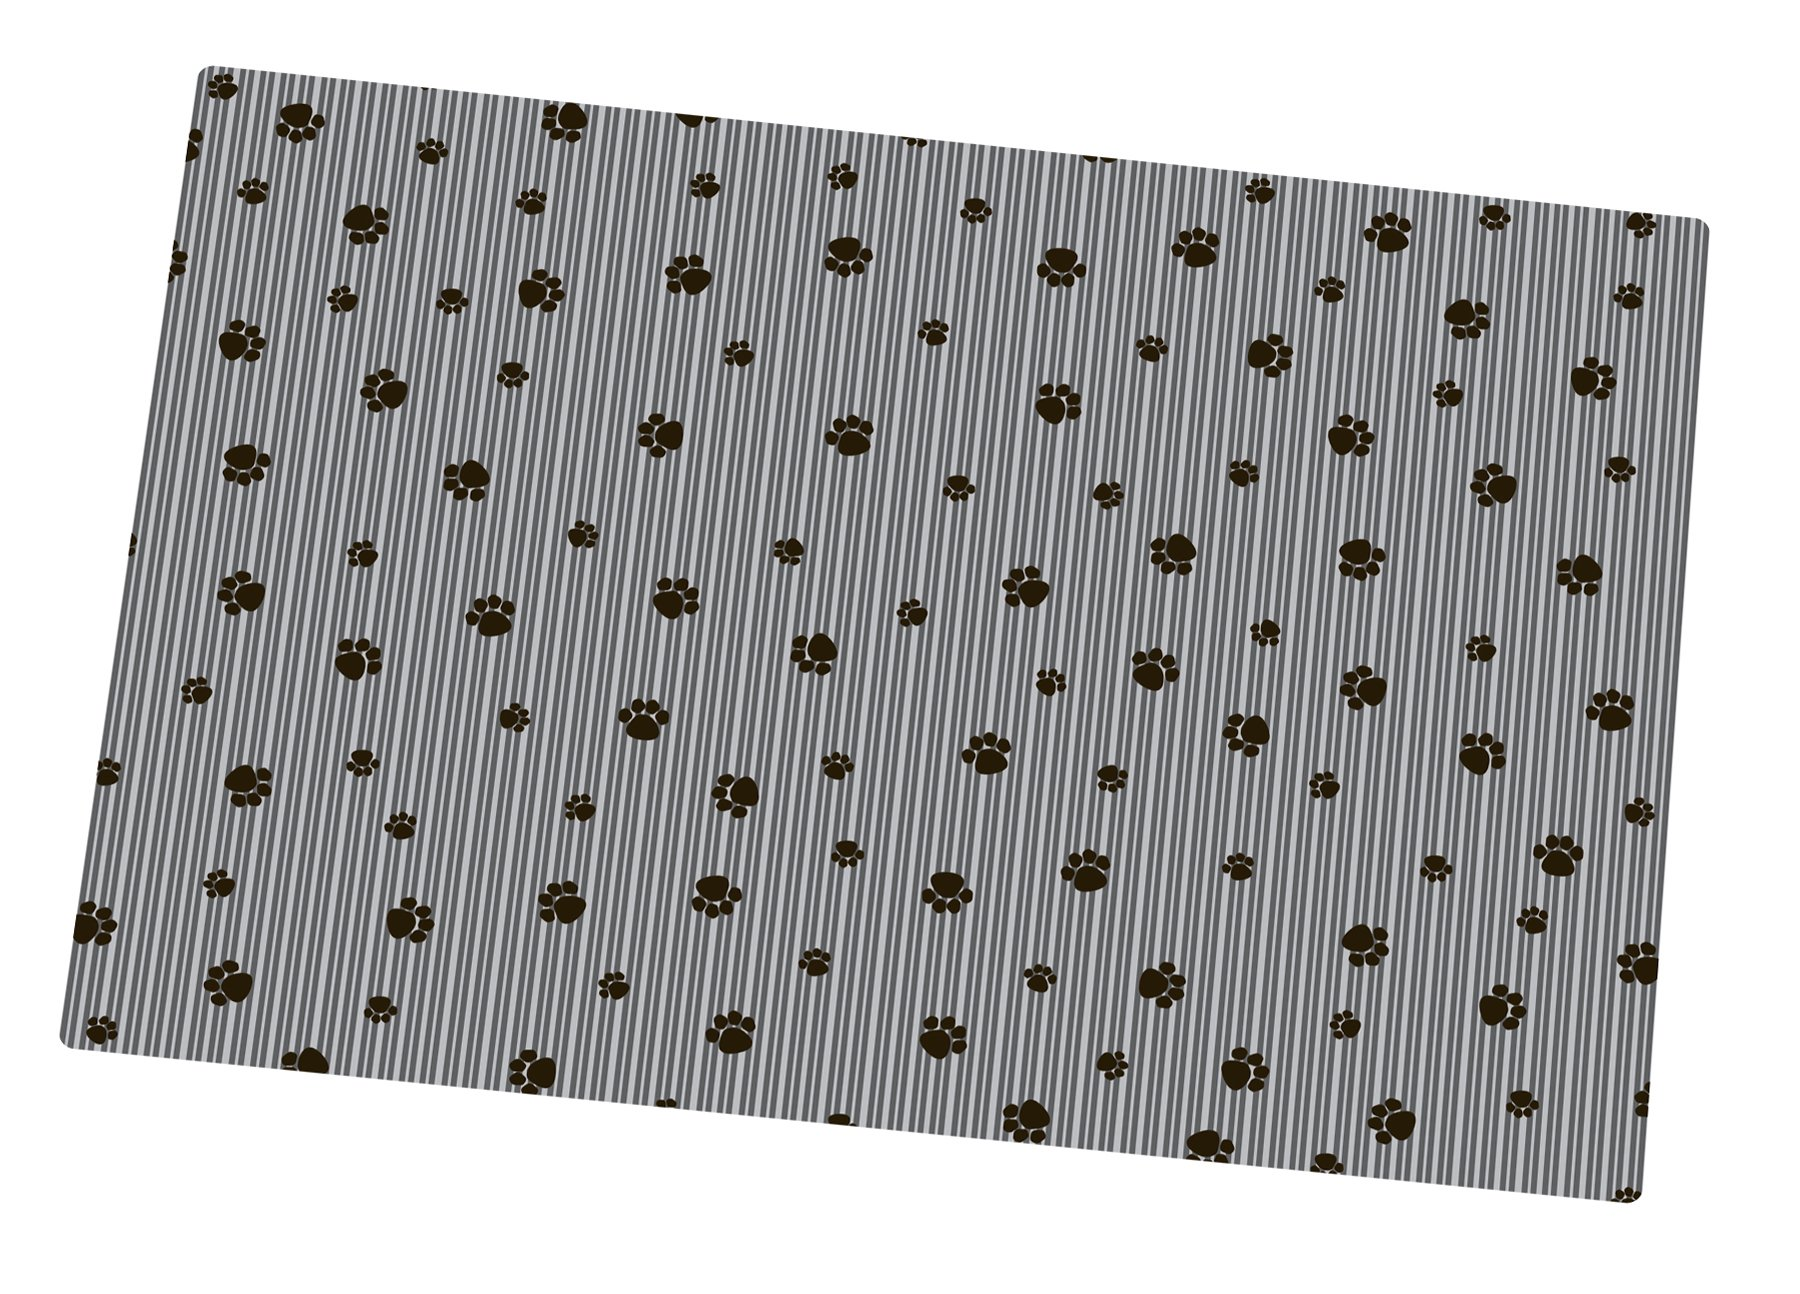 Drymate Litter Mat 20 inch x 28 inch Grey/Black Paw Striped Cat Litter Mat